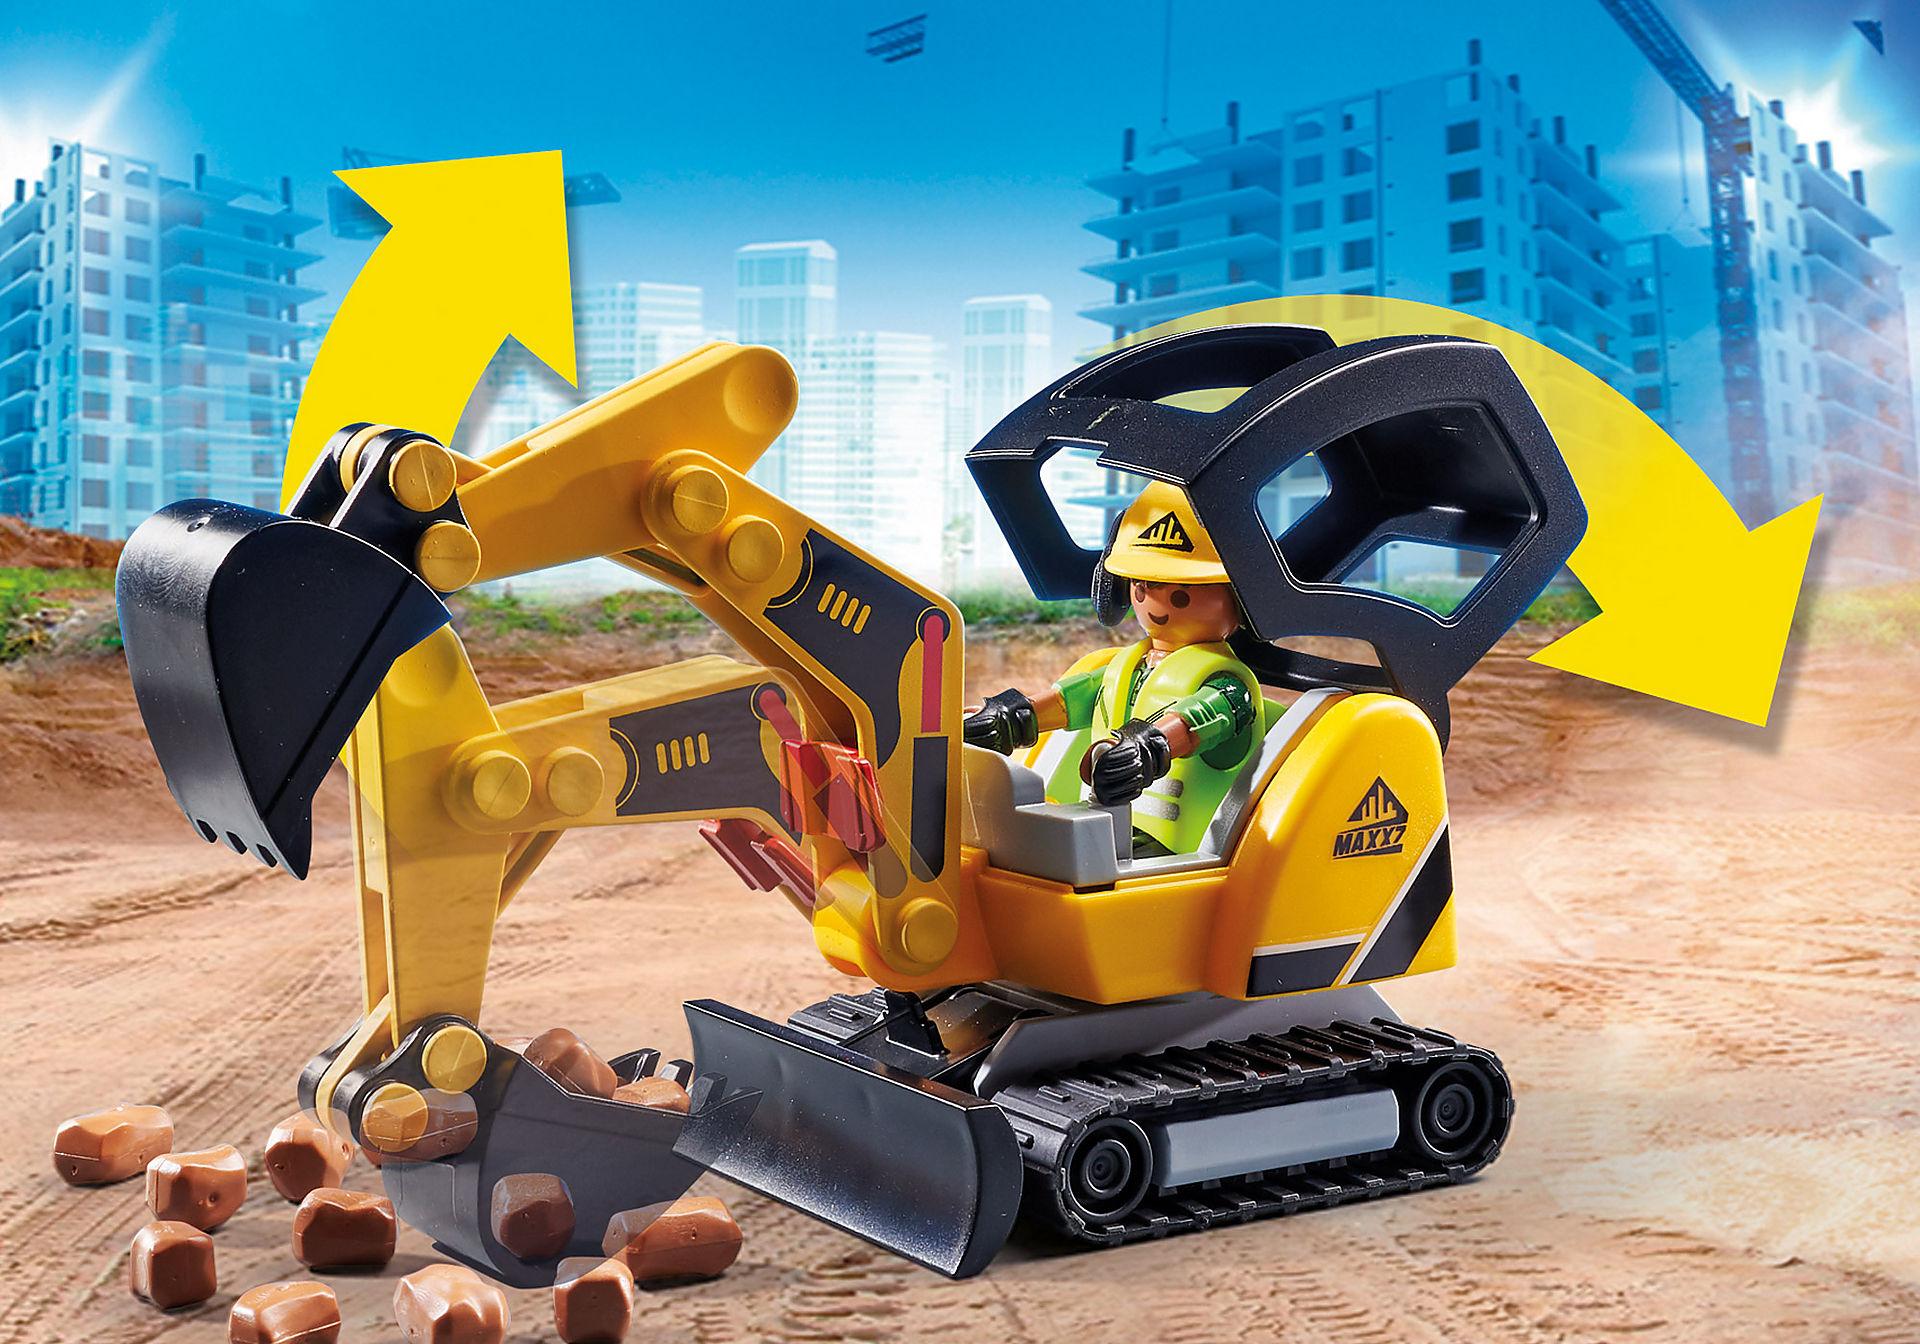 70443 Mini graafmachine met bouwonderdeel zoom image5